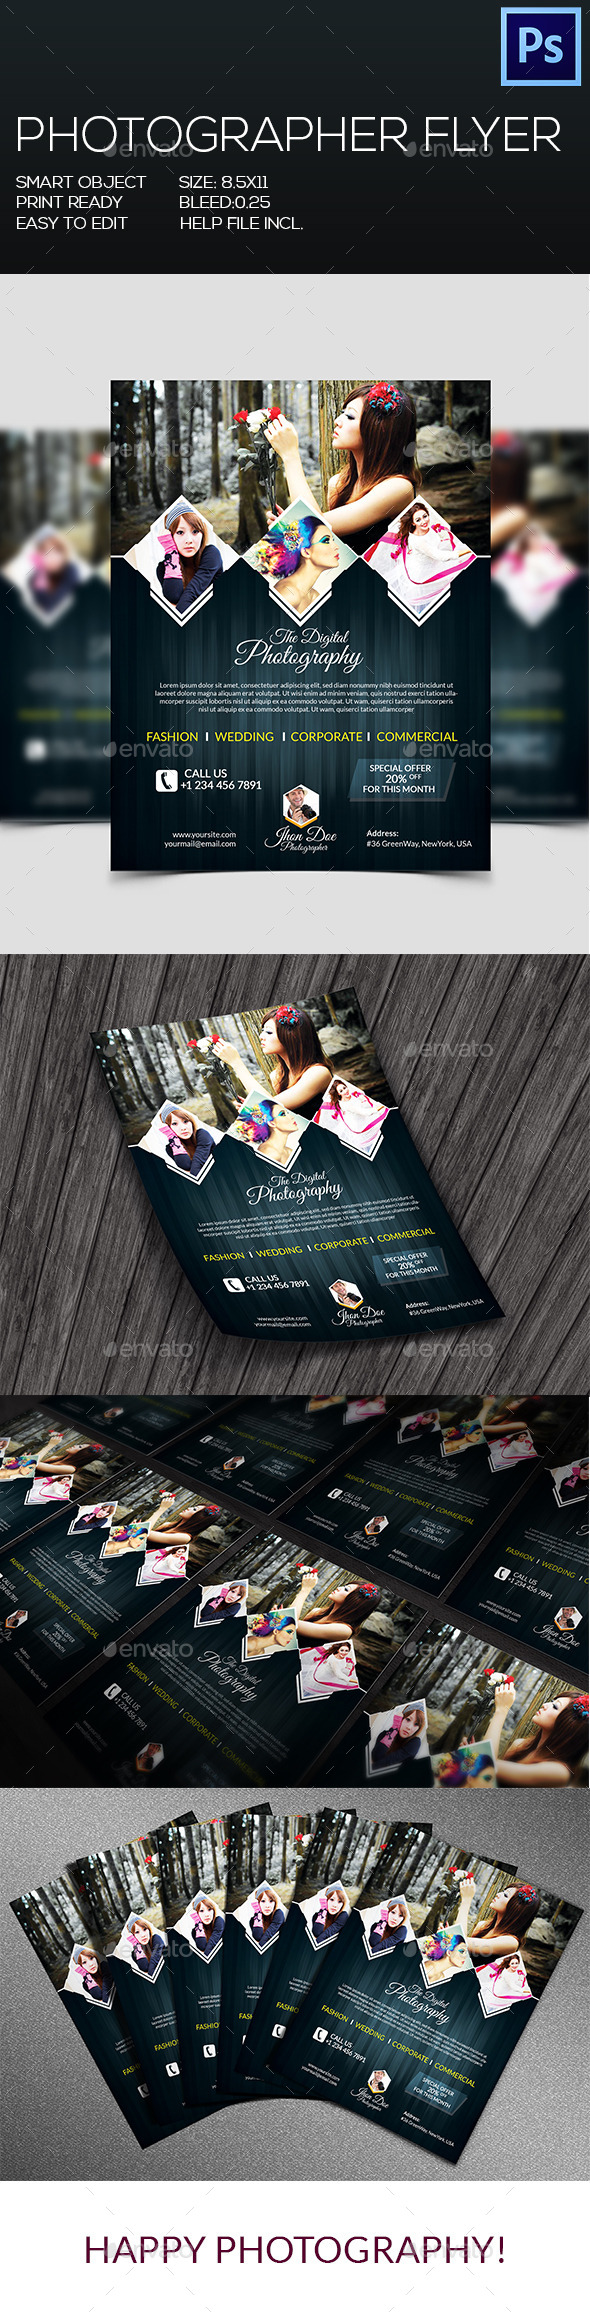 GraphicRiver Photographer Flyer V-2 8989608